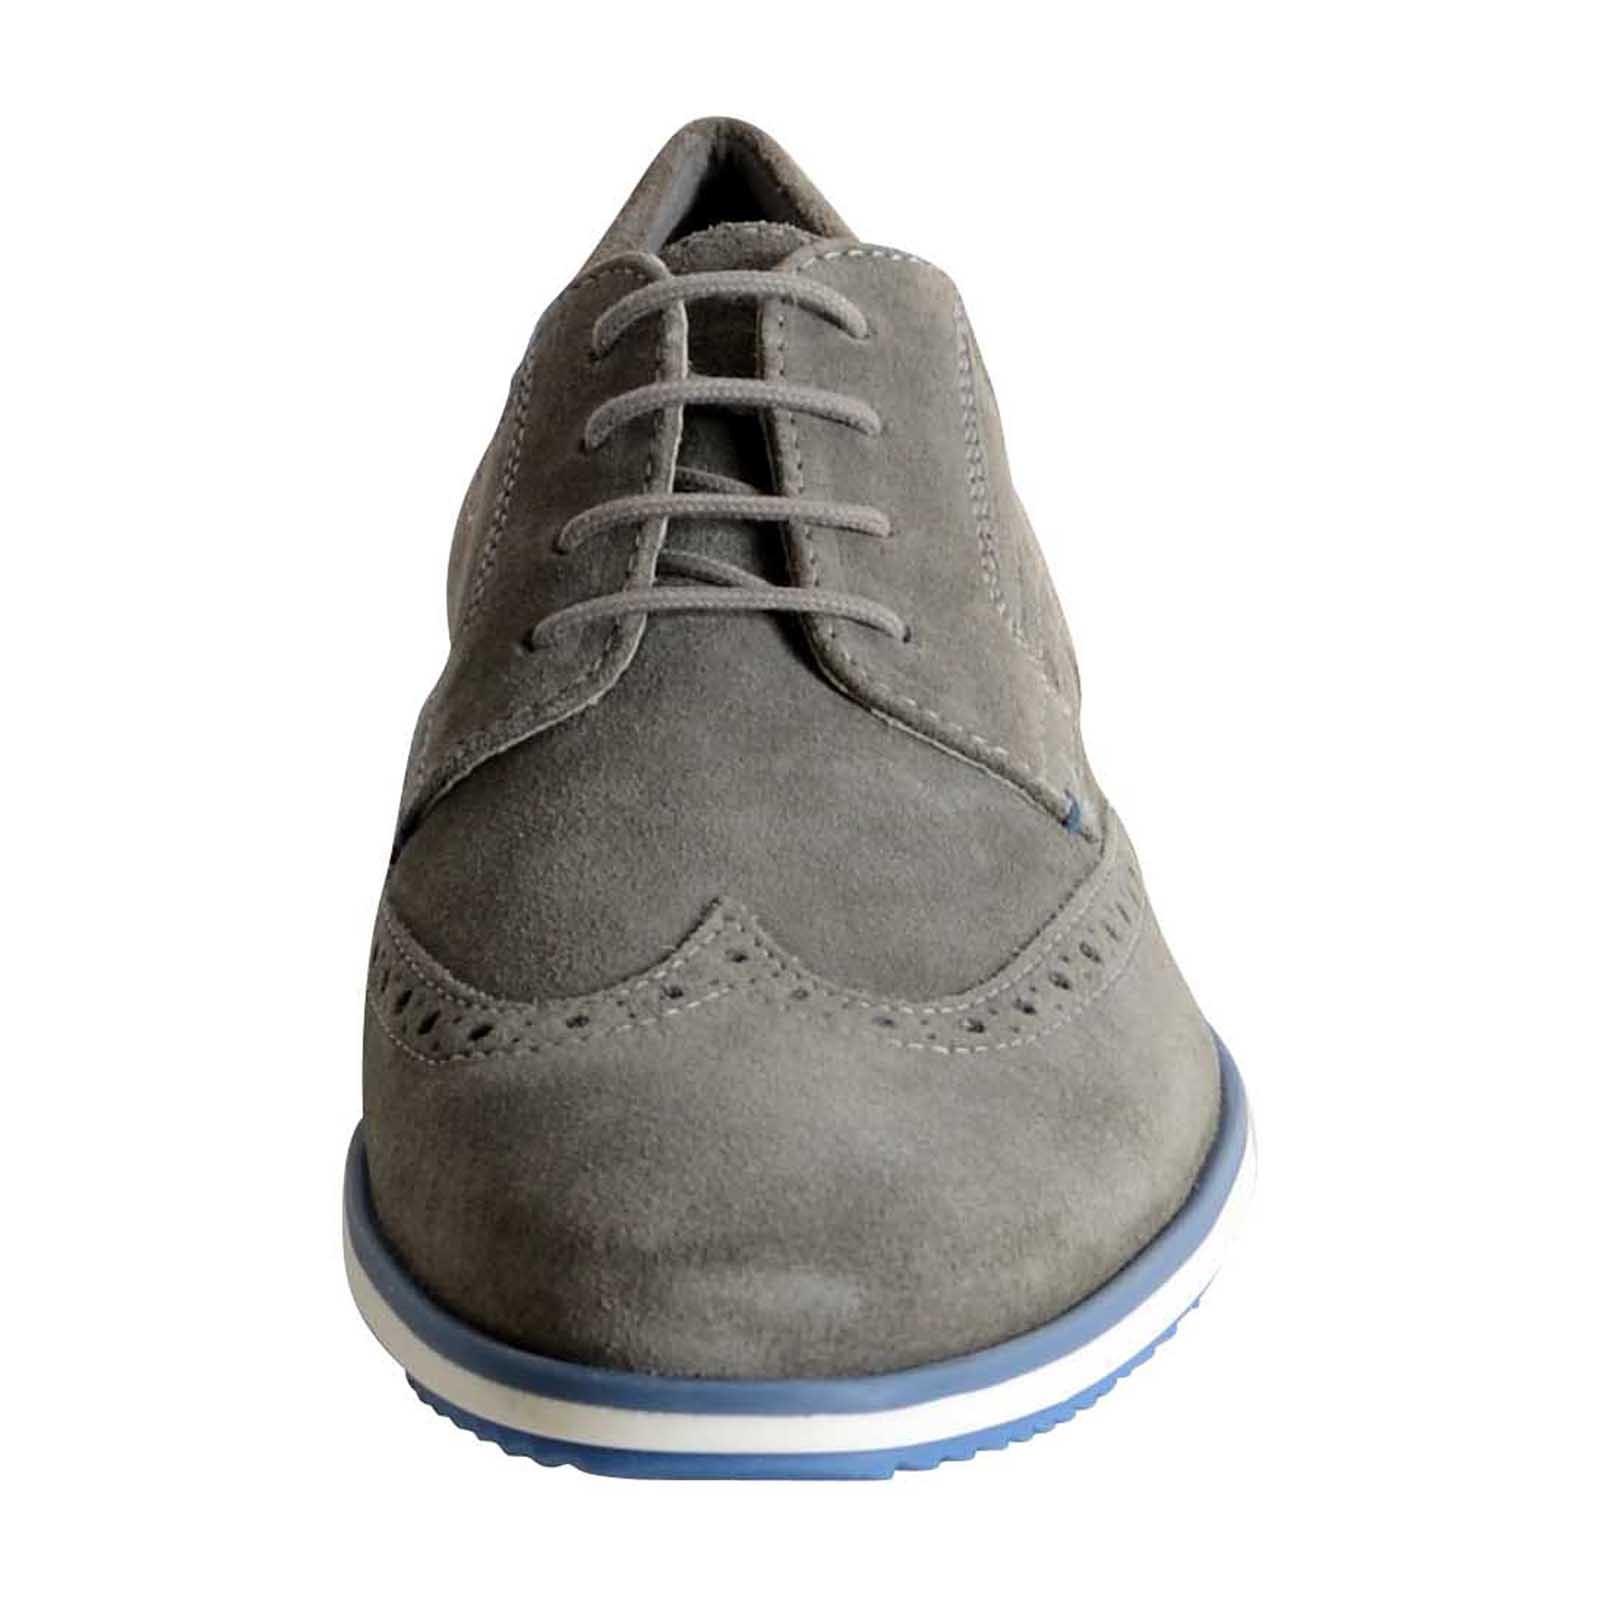 Chaussure-Geox-U-BLAINEY-A-SUEDE miniature 7